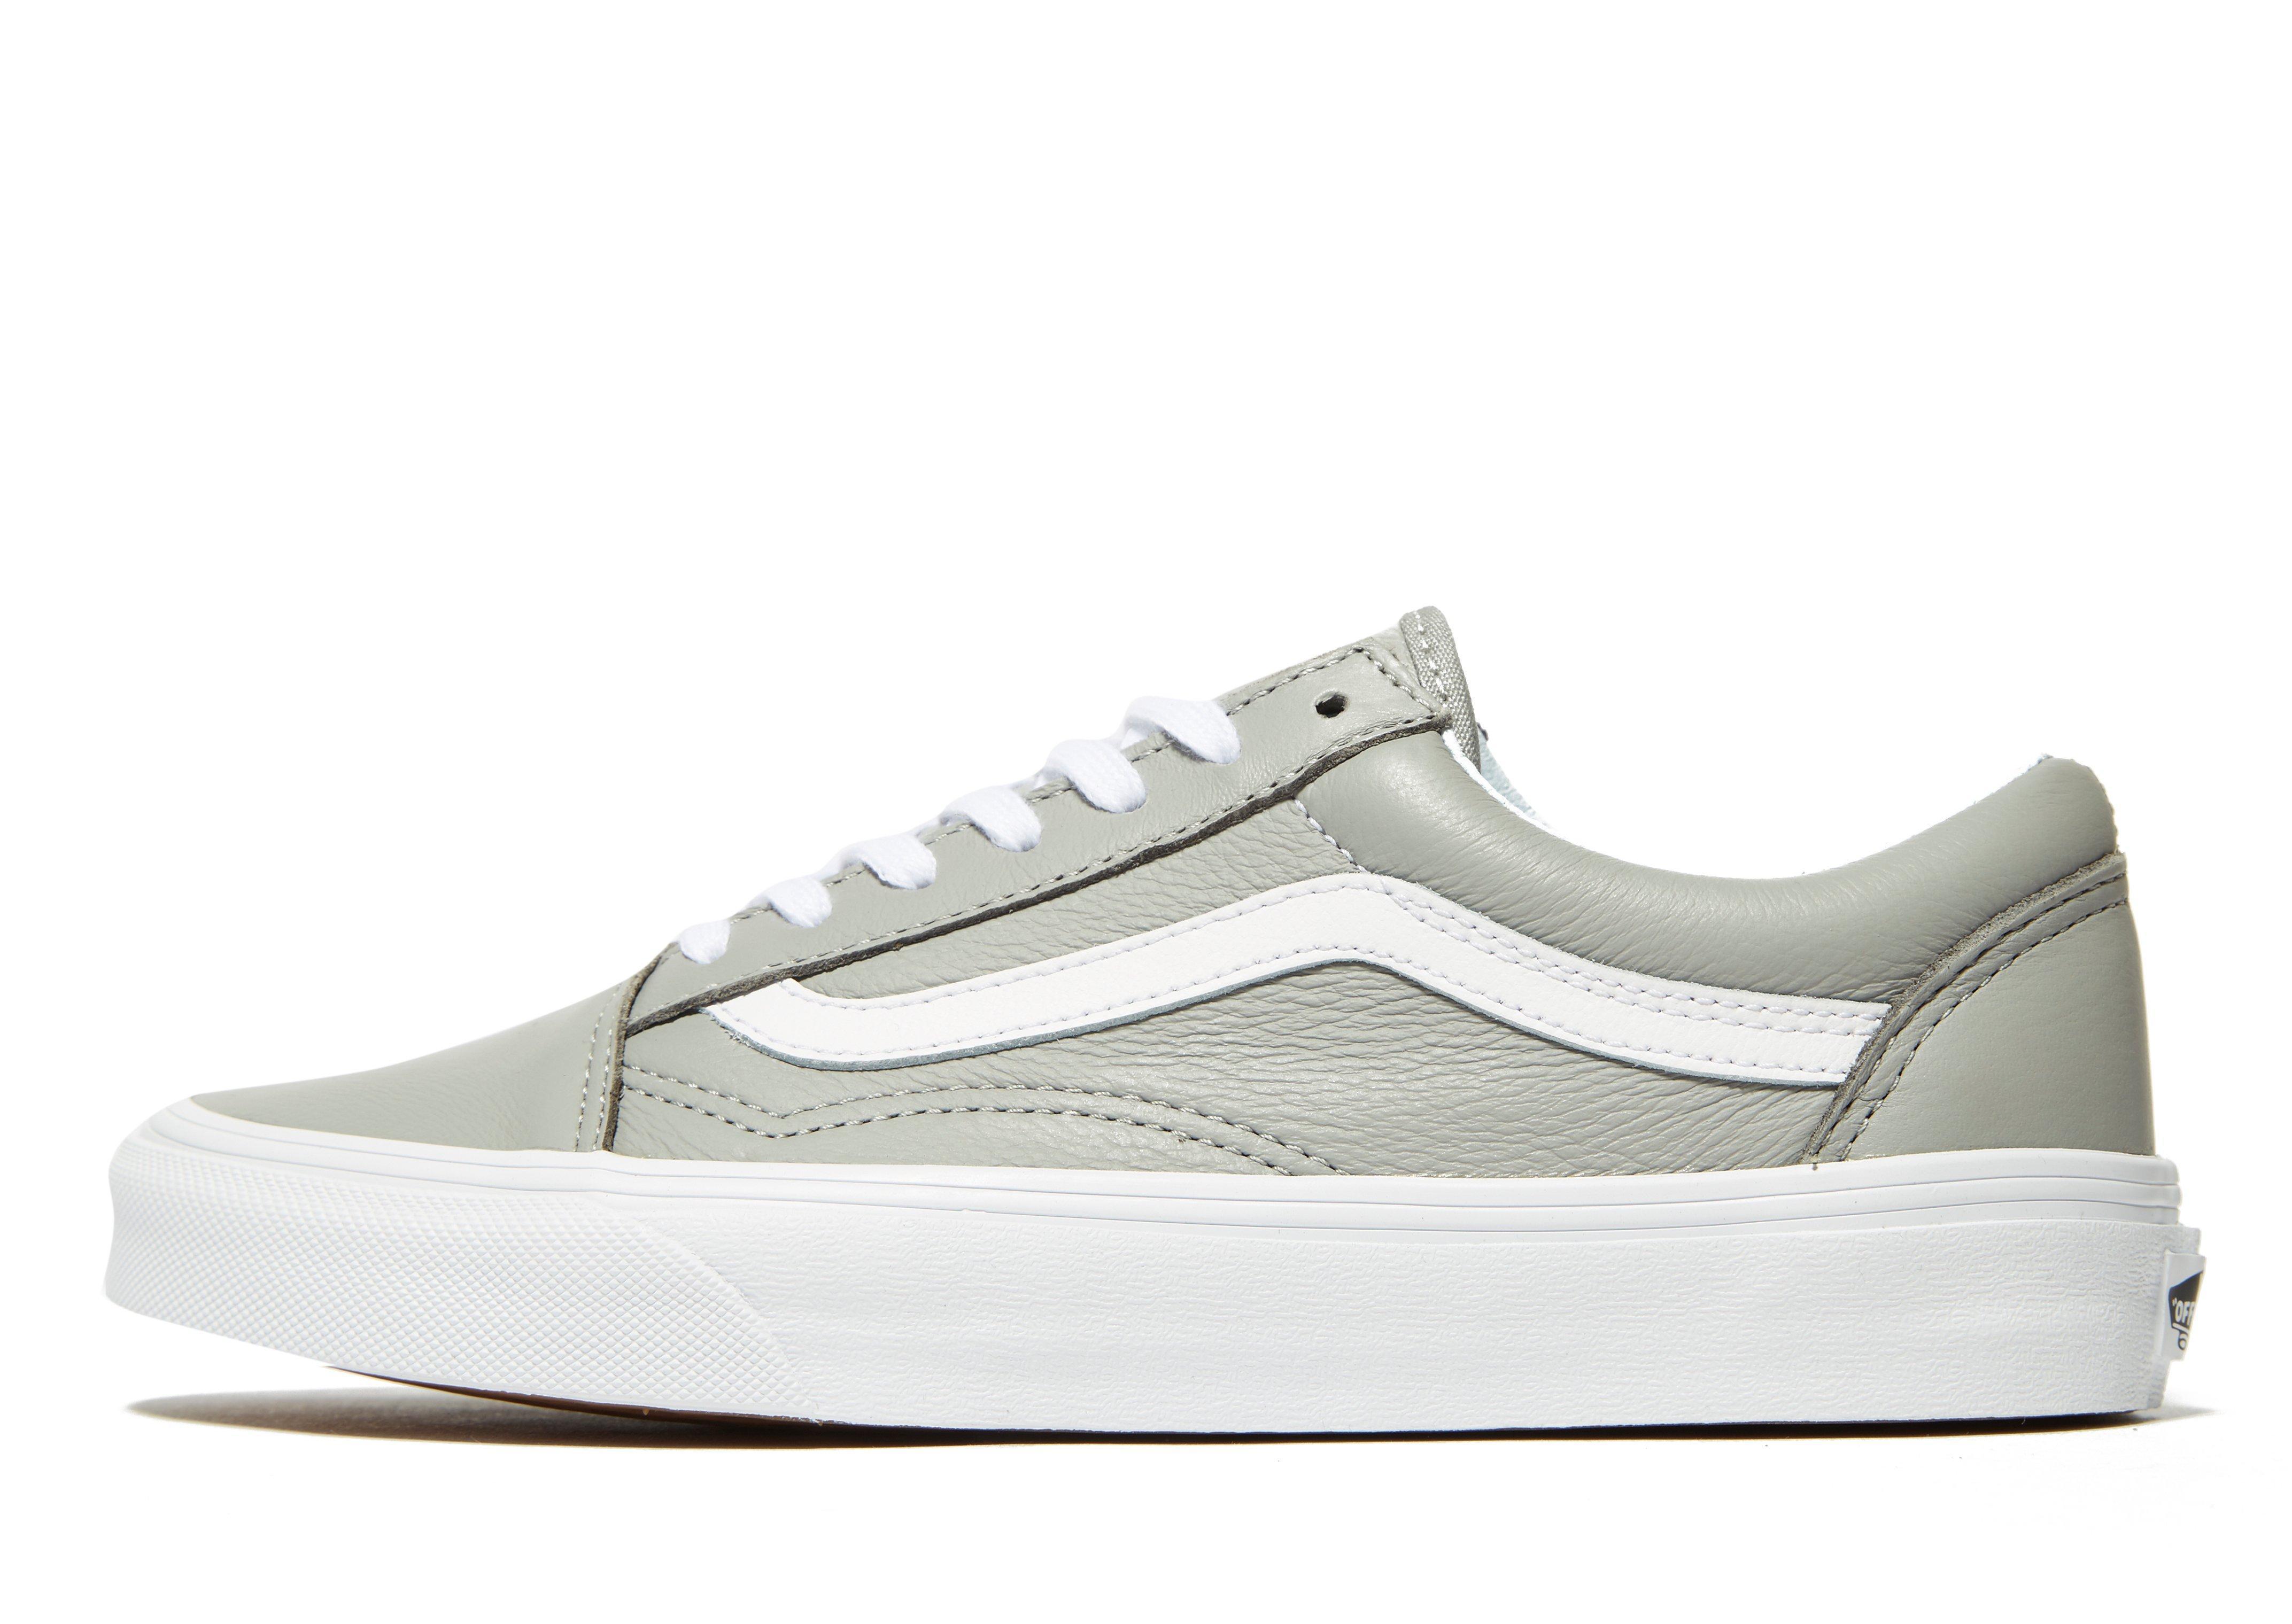 6cec3583a4ee Lyst - Vans Old Skool Leather in Gray for Men